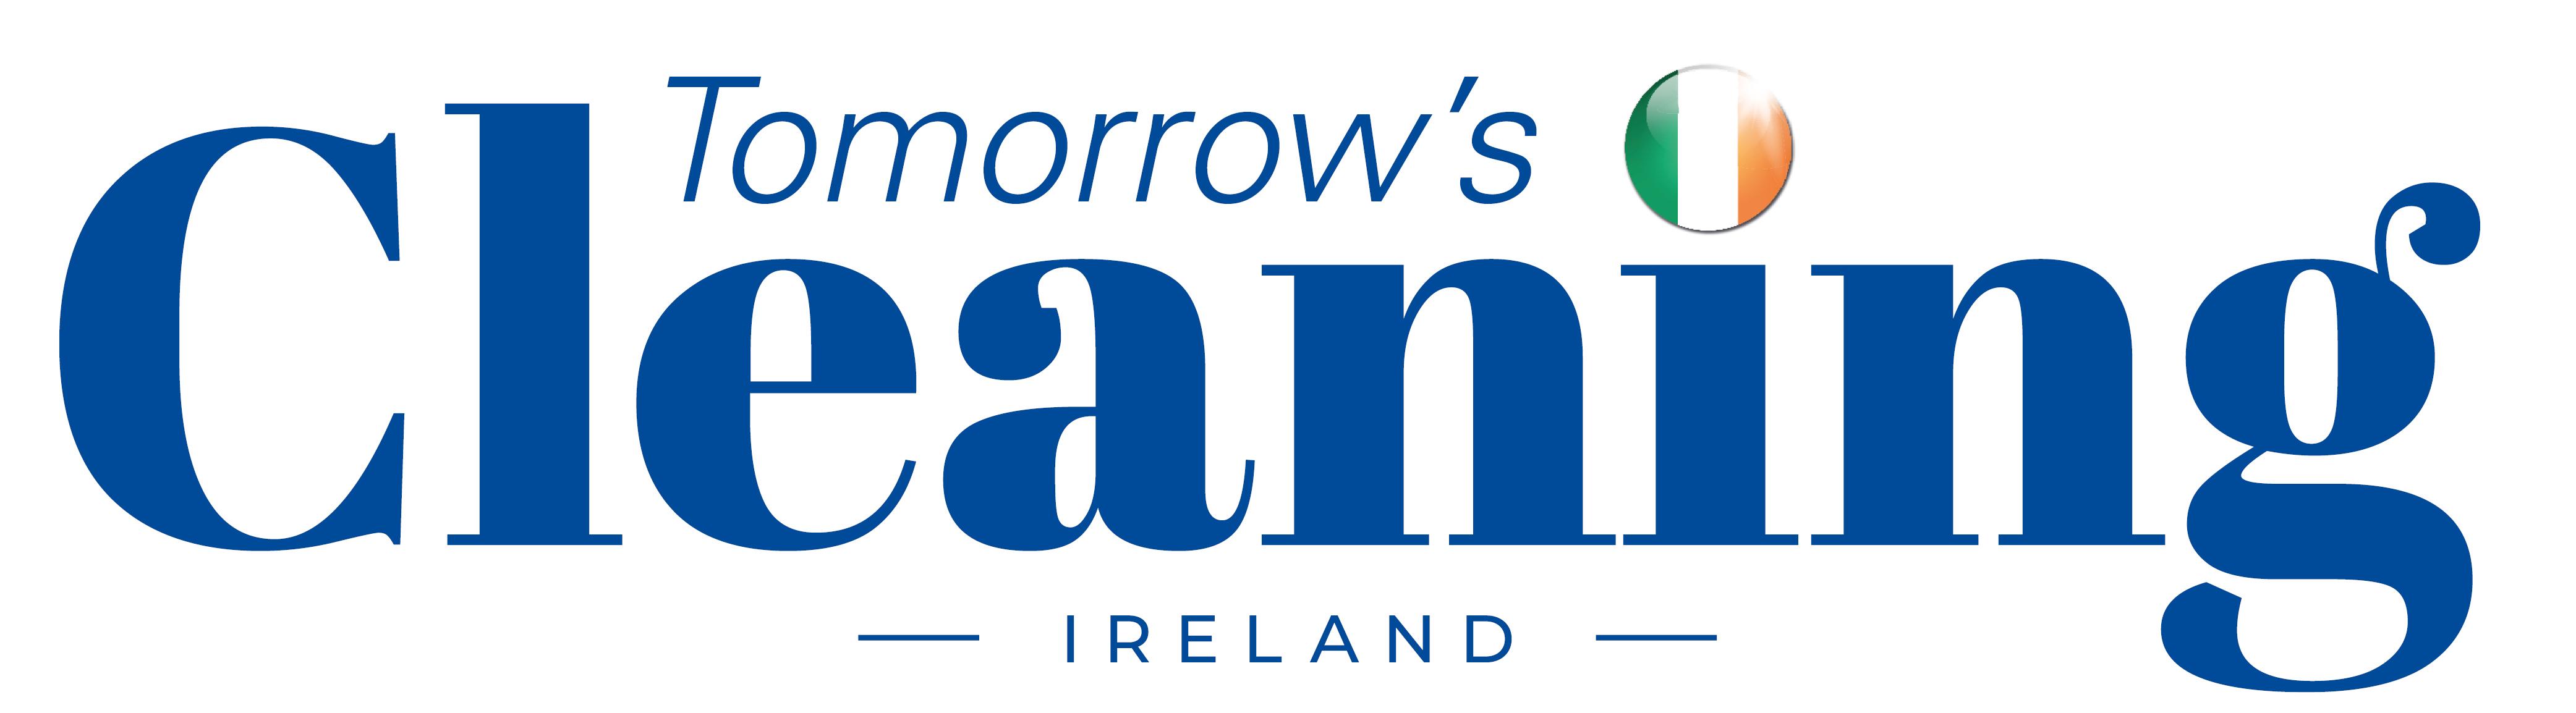 TC Ireland